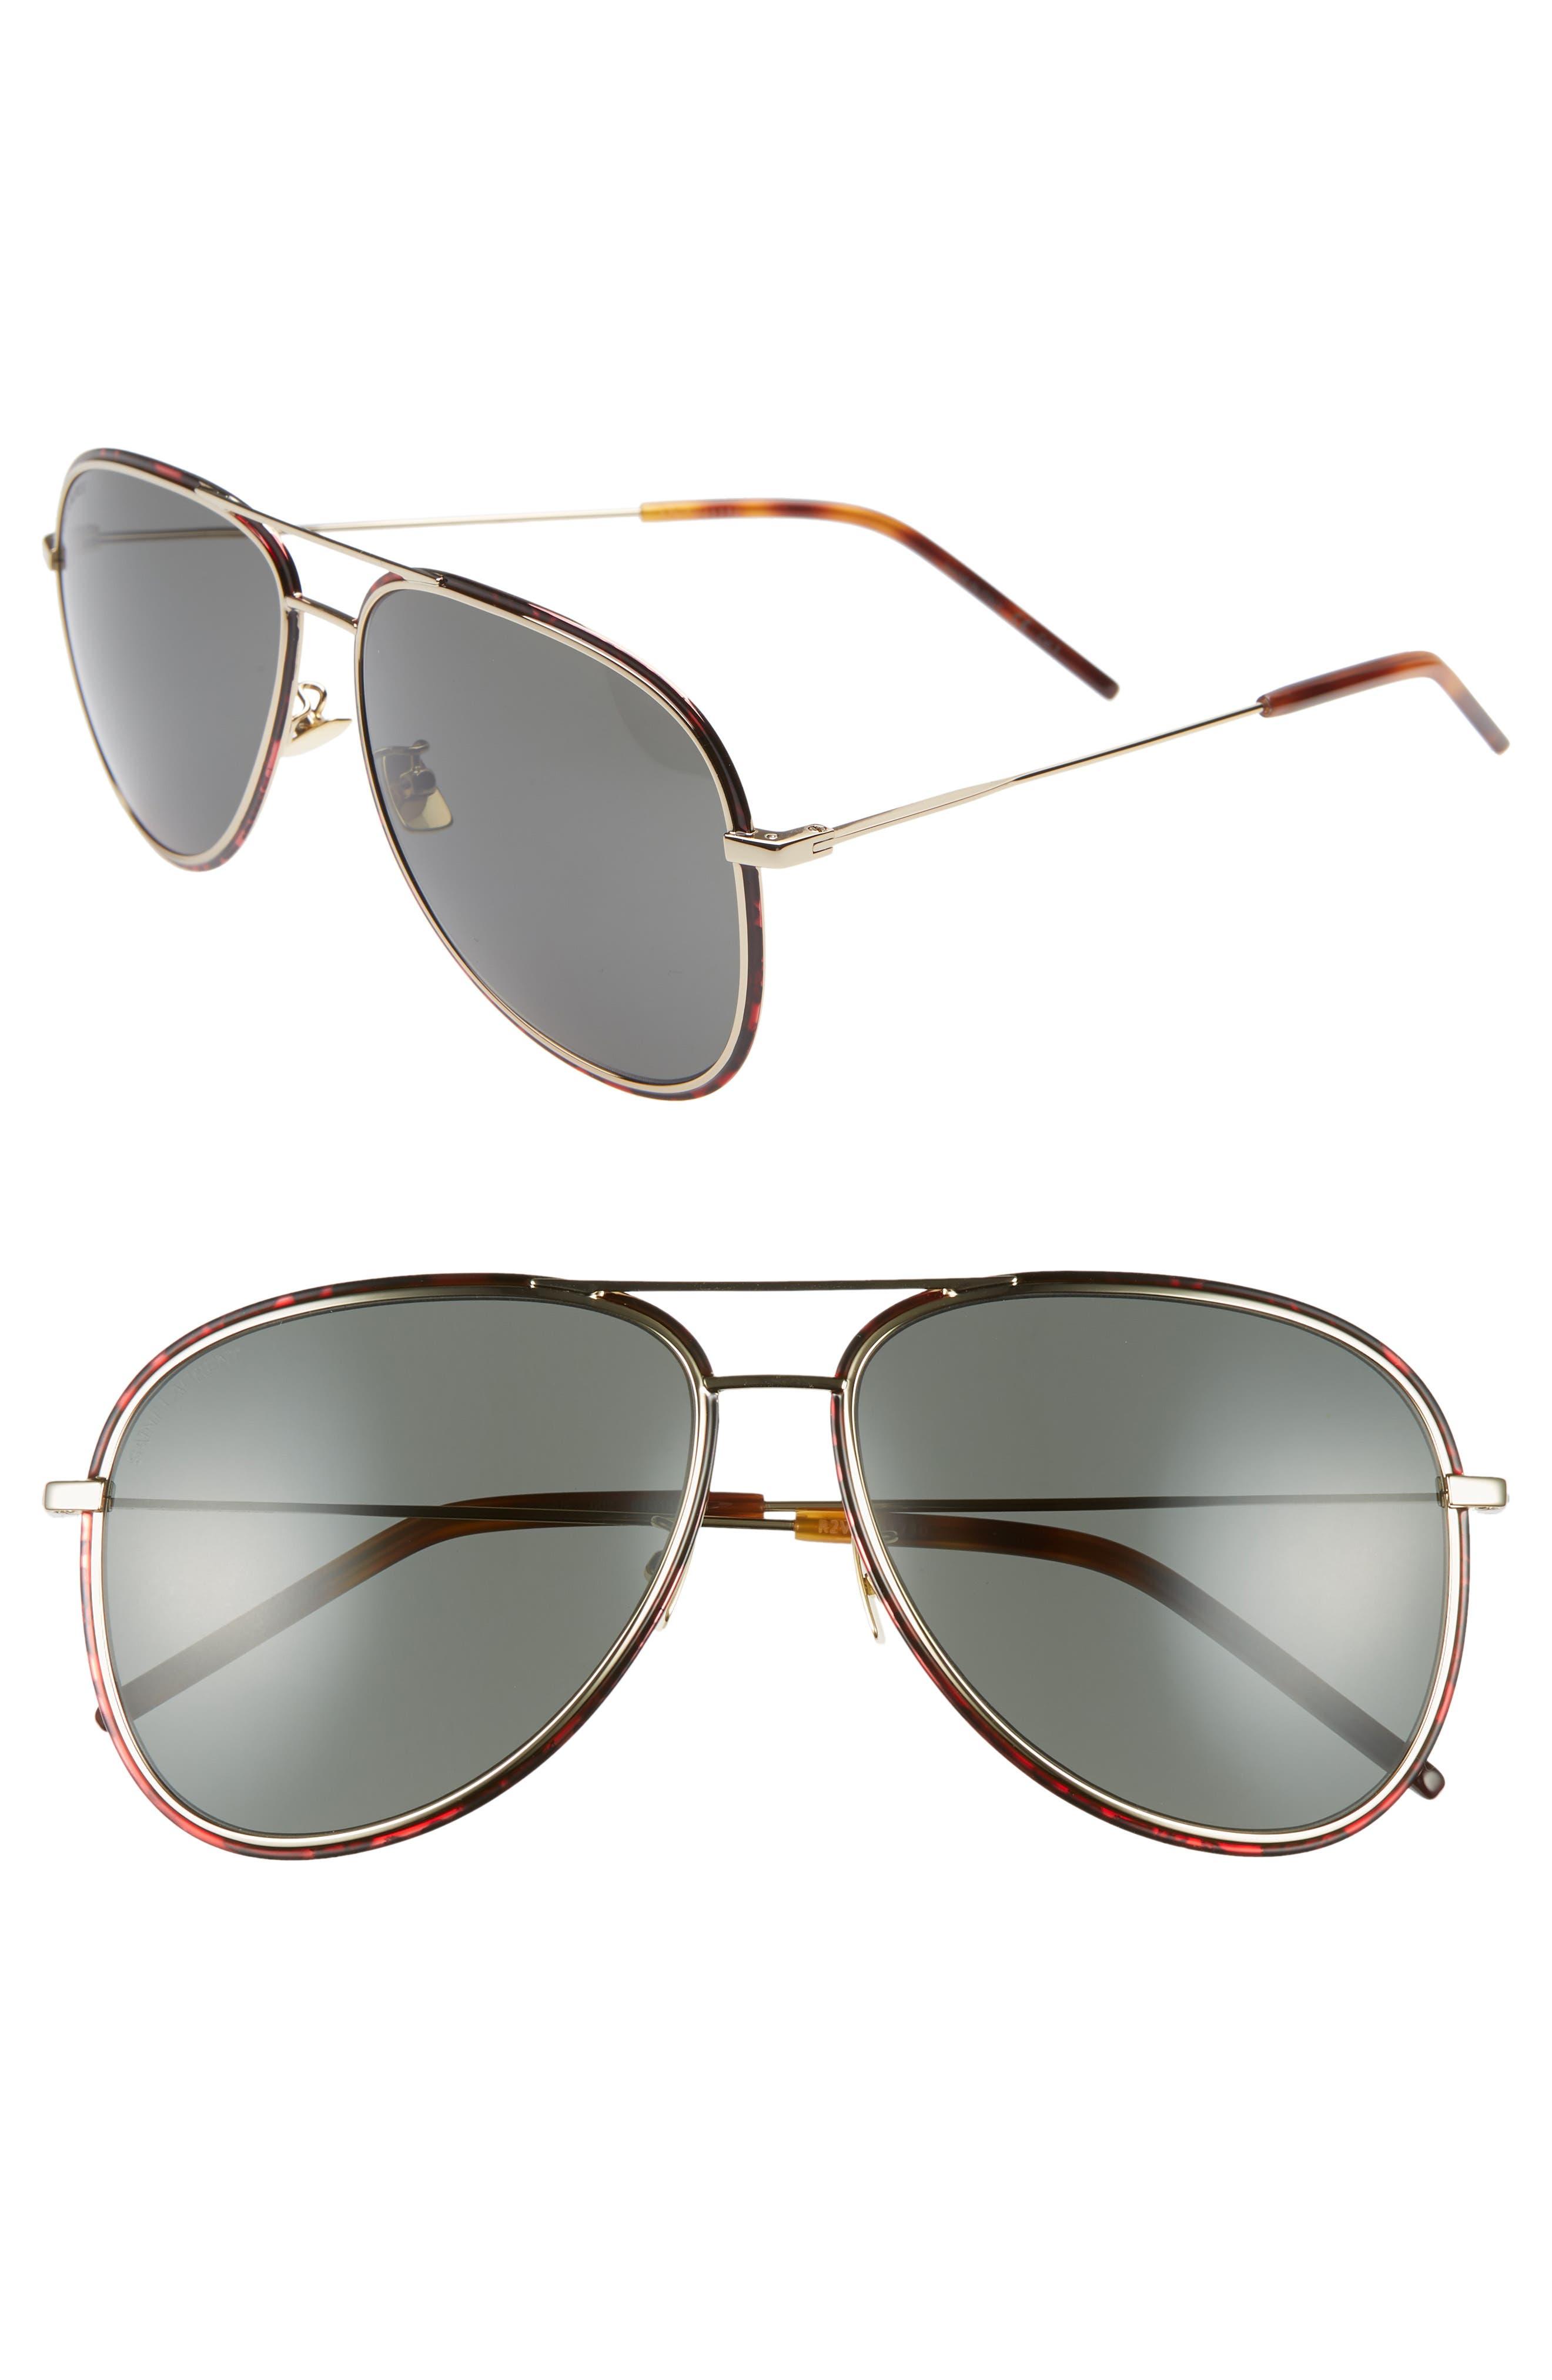 Saint Laurent 61Mm Aviator Sunglasses - Light Gold/ Black Red/ Grey